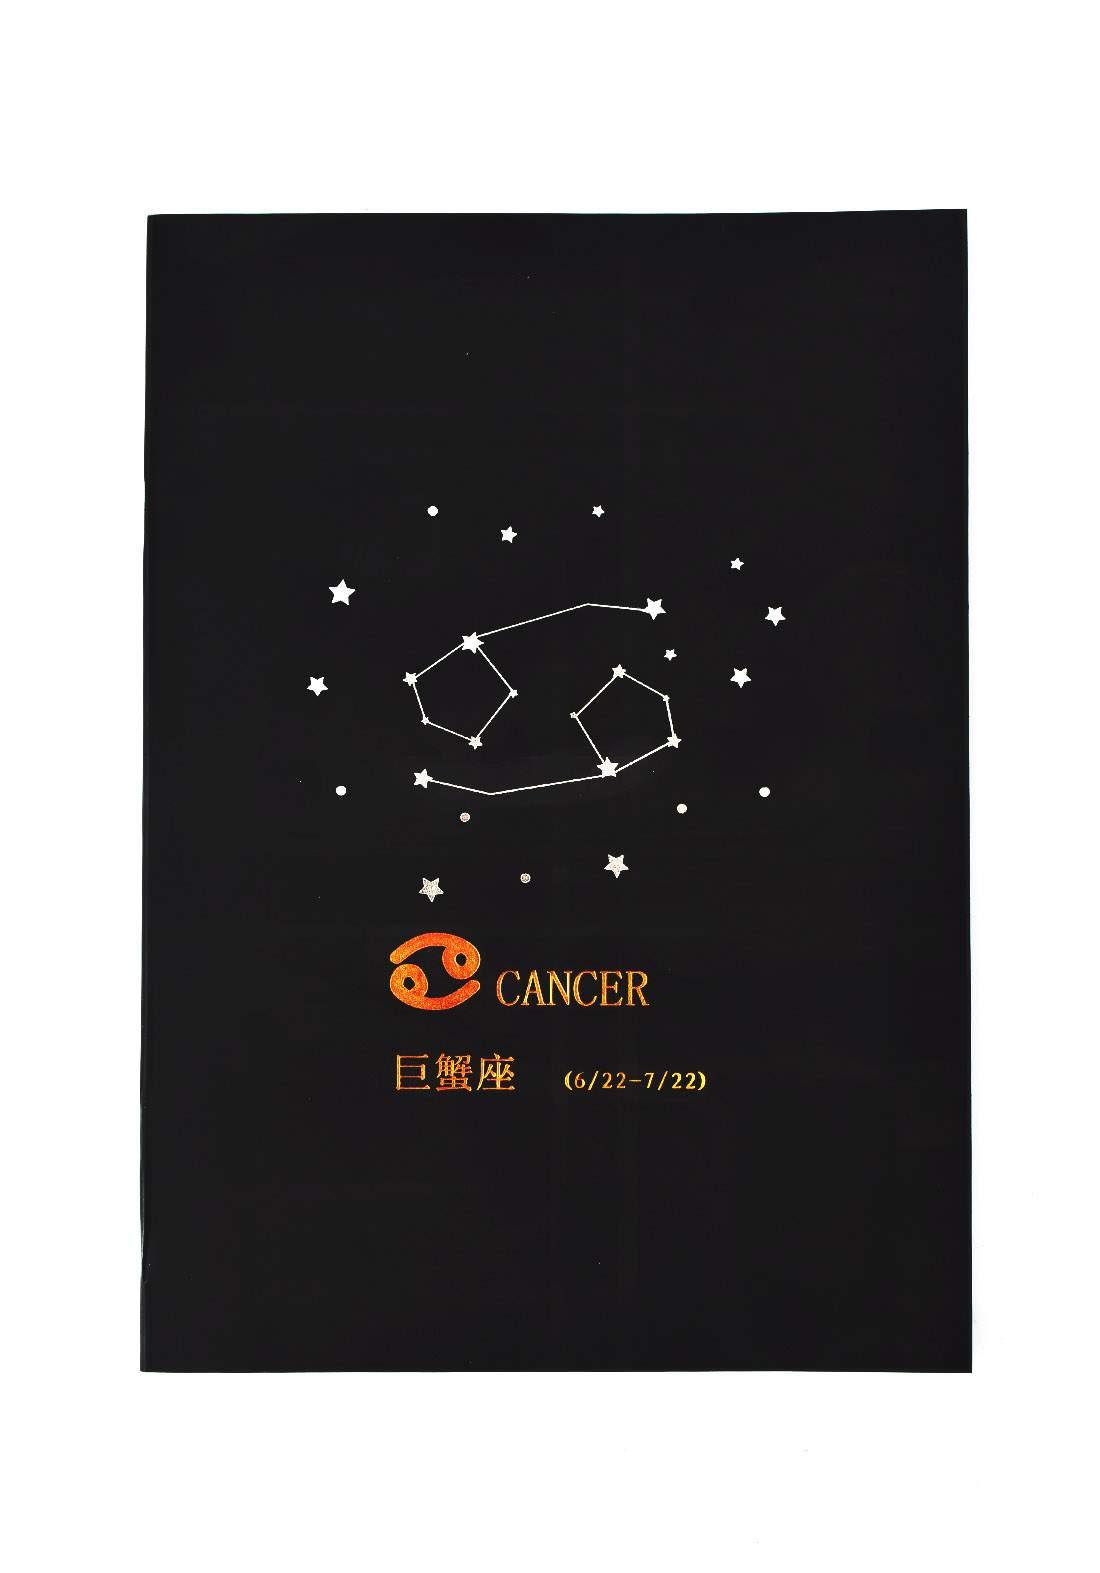 Big Black Drawing Book 24 Sheets-Cancer دفتر رسم اسود كبير بطبعة برج السرطان